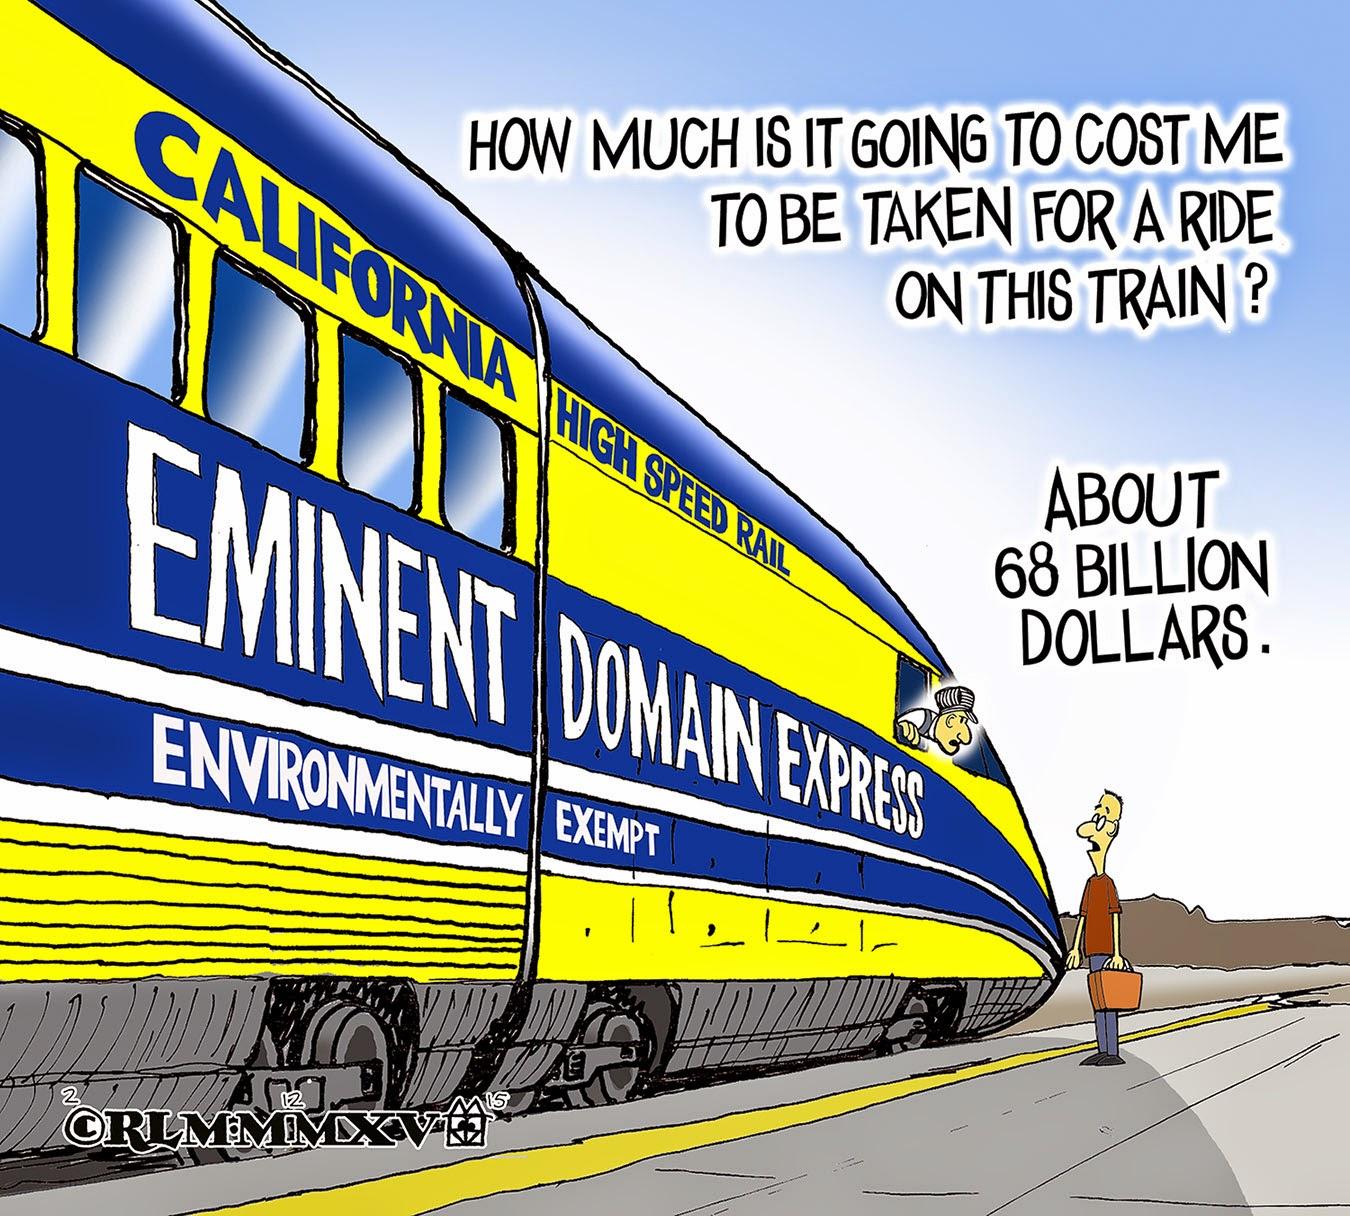 Eminent Domain Express